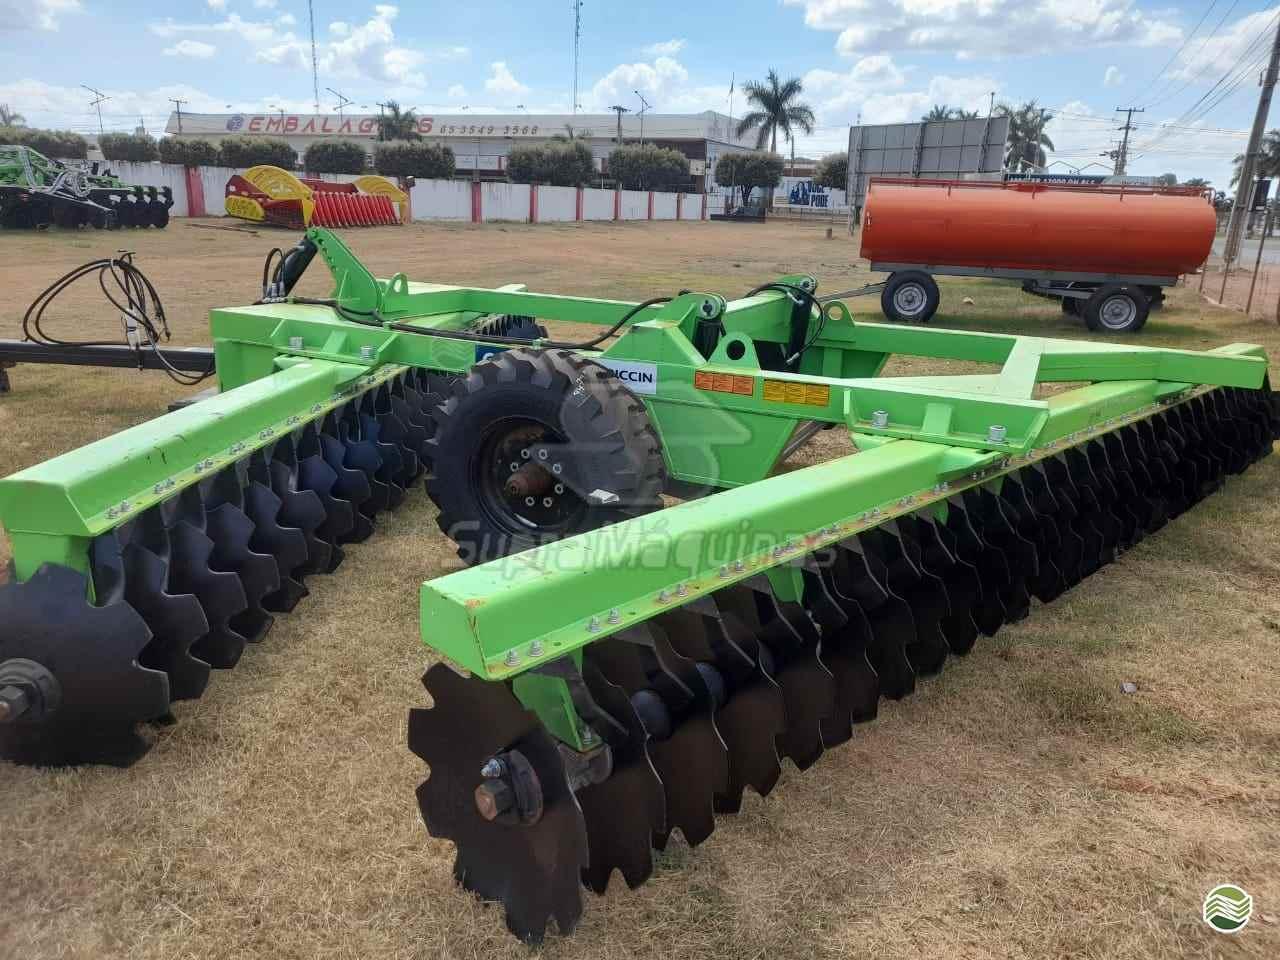 IMPLEMENTOS AGRICOLAS GRADE NIVELADORA NIVELADORA 60 DISCOS Supra Máquinas LUCAS DO RIO VERDE MATO GROSSO MT